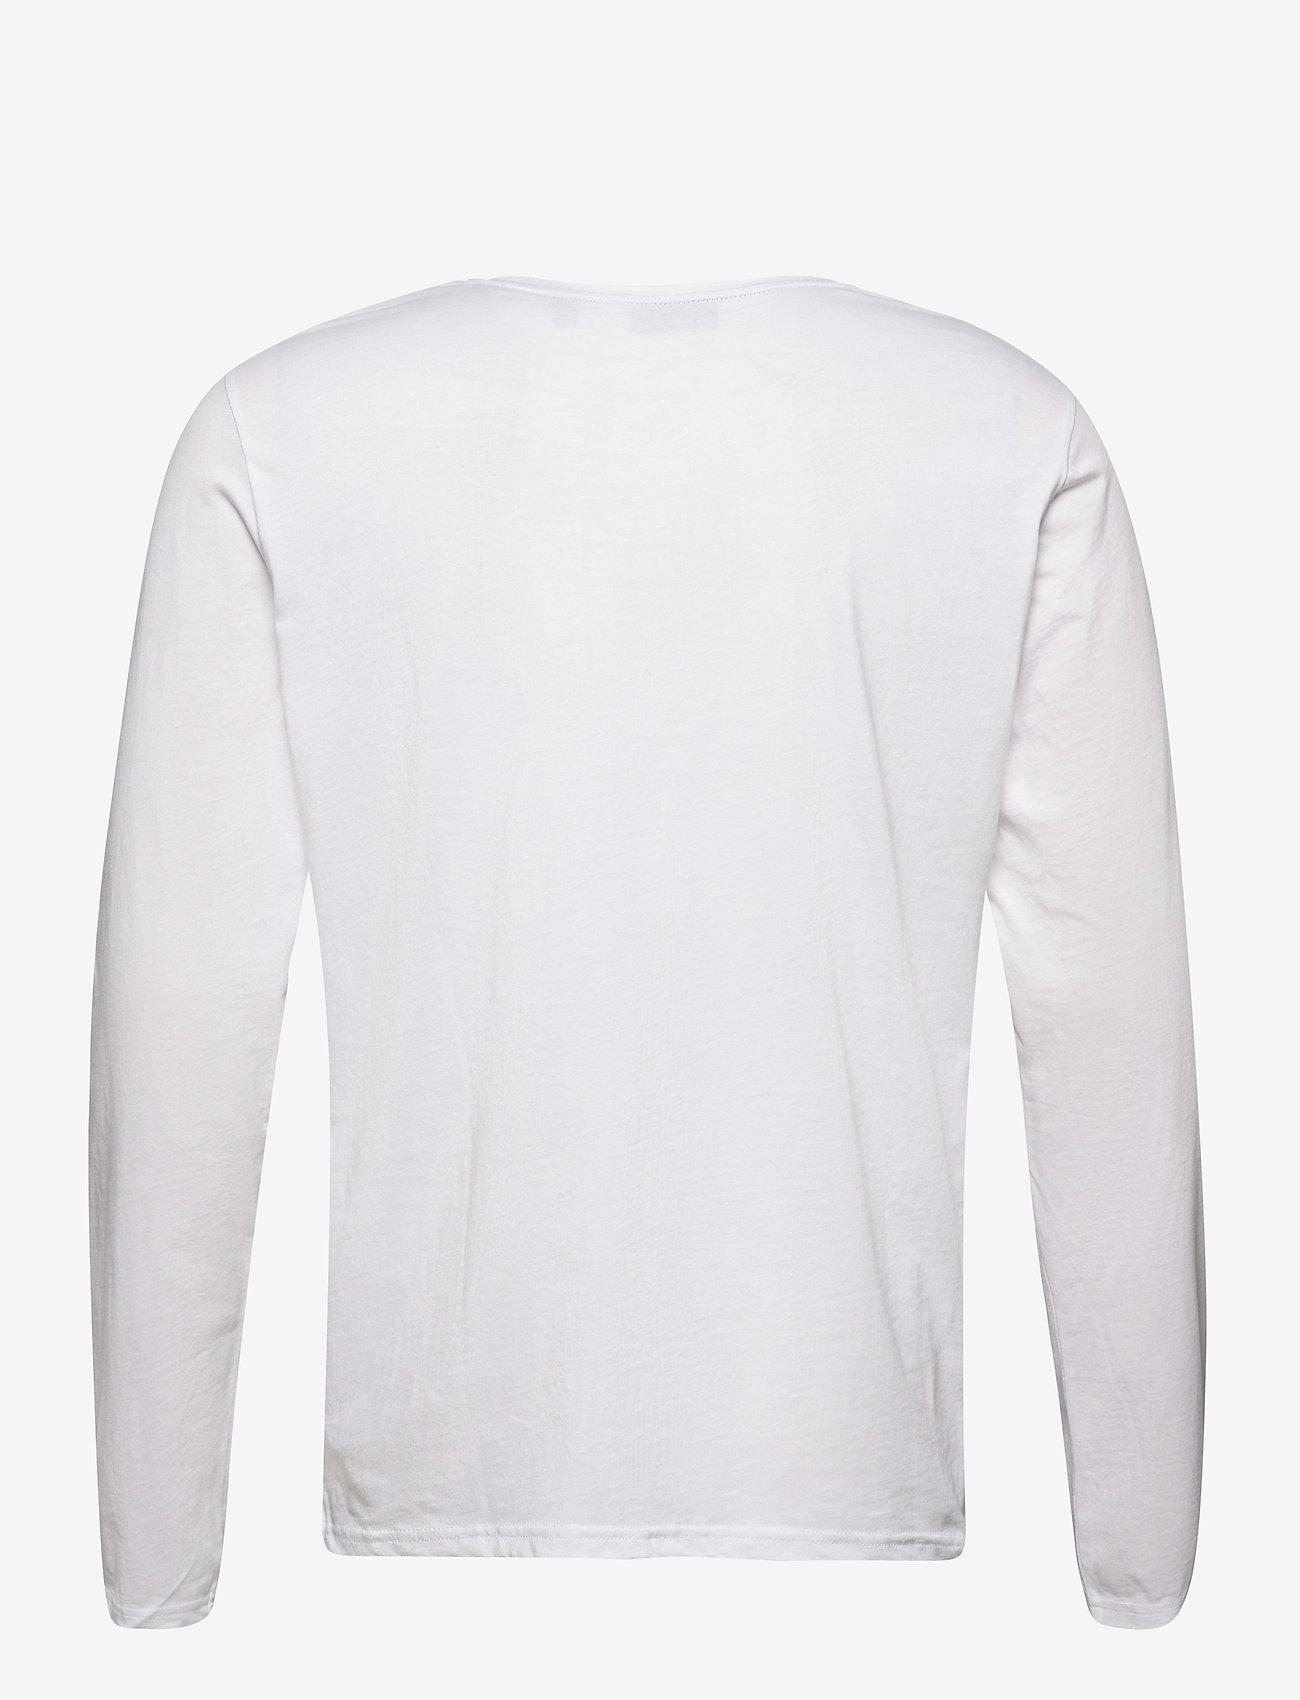 GANT - GANT LOCK UP LS T-SHIRT - long-sleeved t-shirts - white - 1